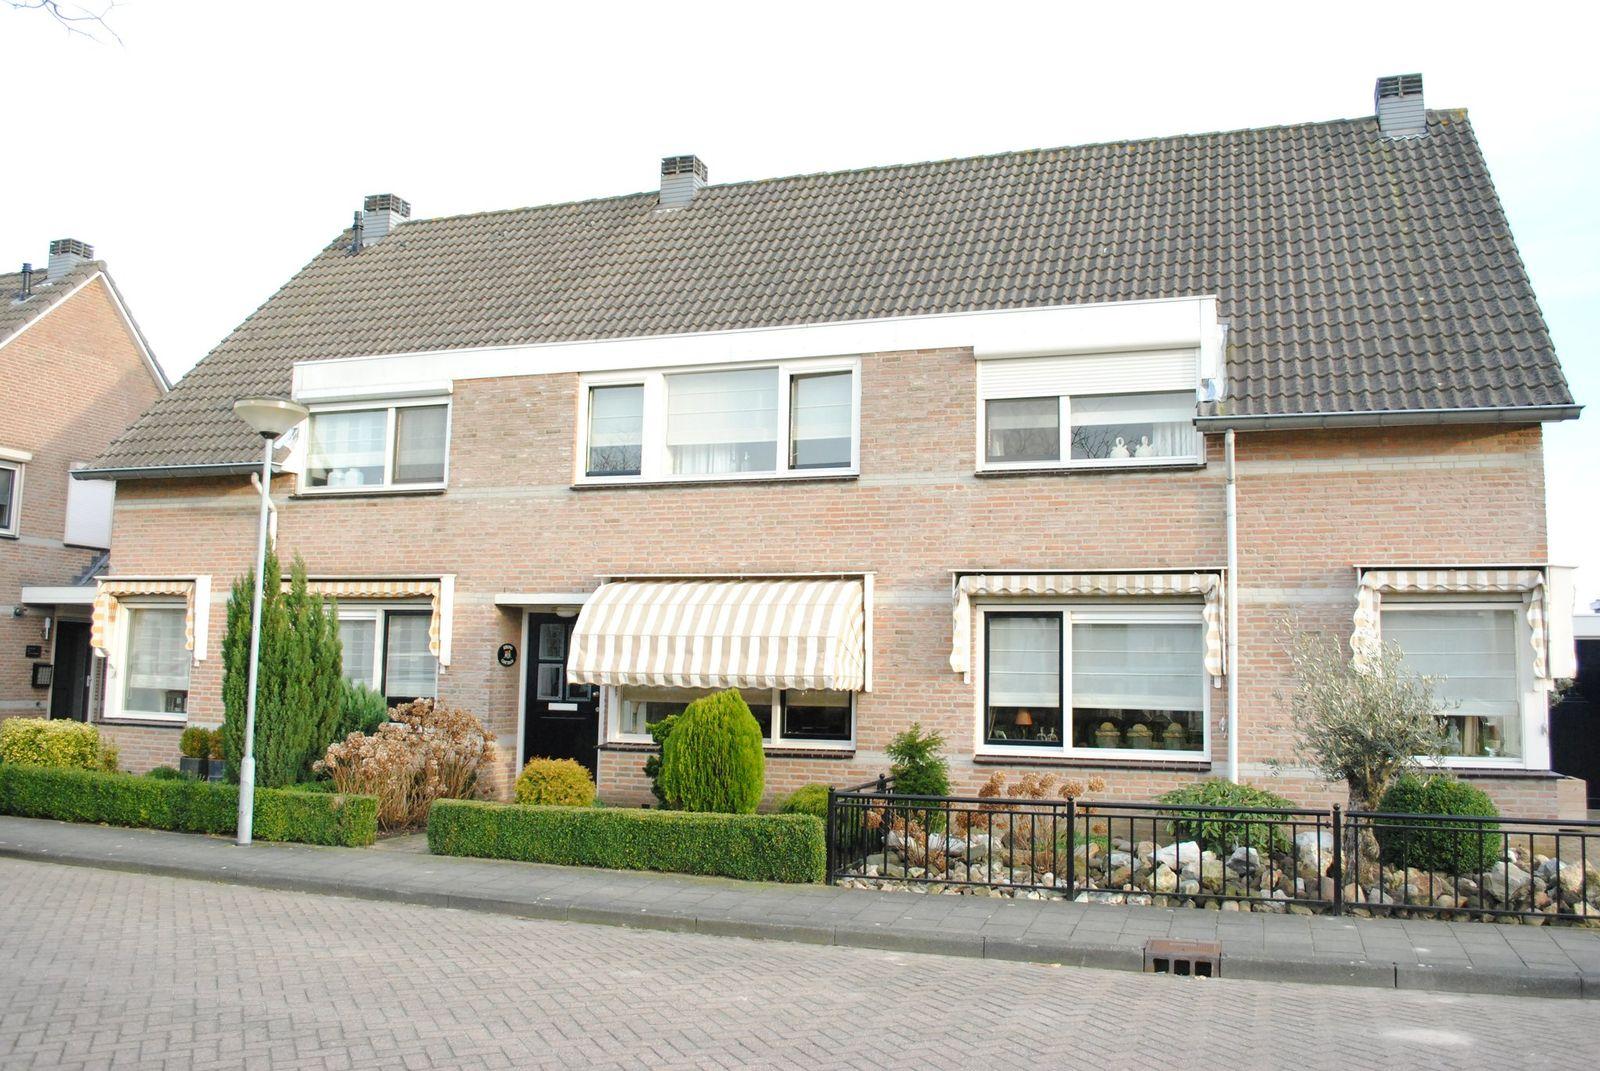 Mr. Rietkerklaan 40, Helmond